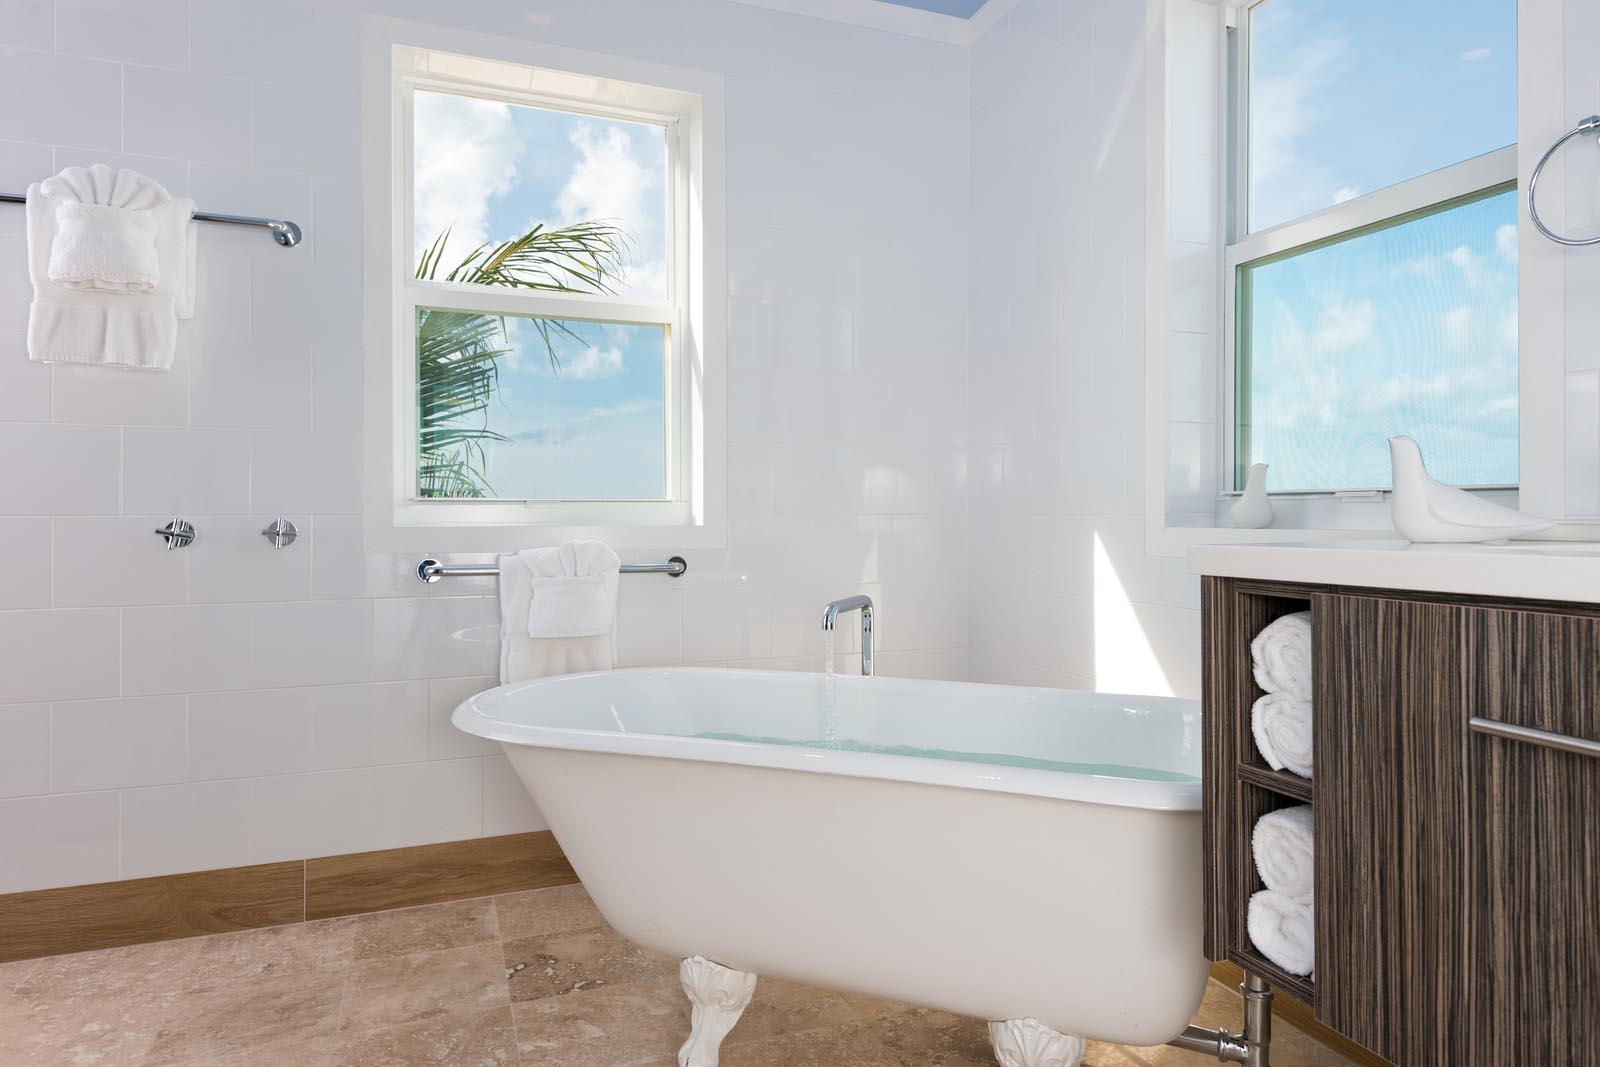 Every master bedroom has an en-suite bathroom